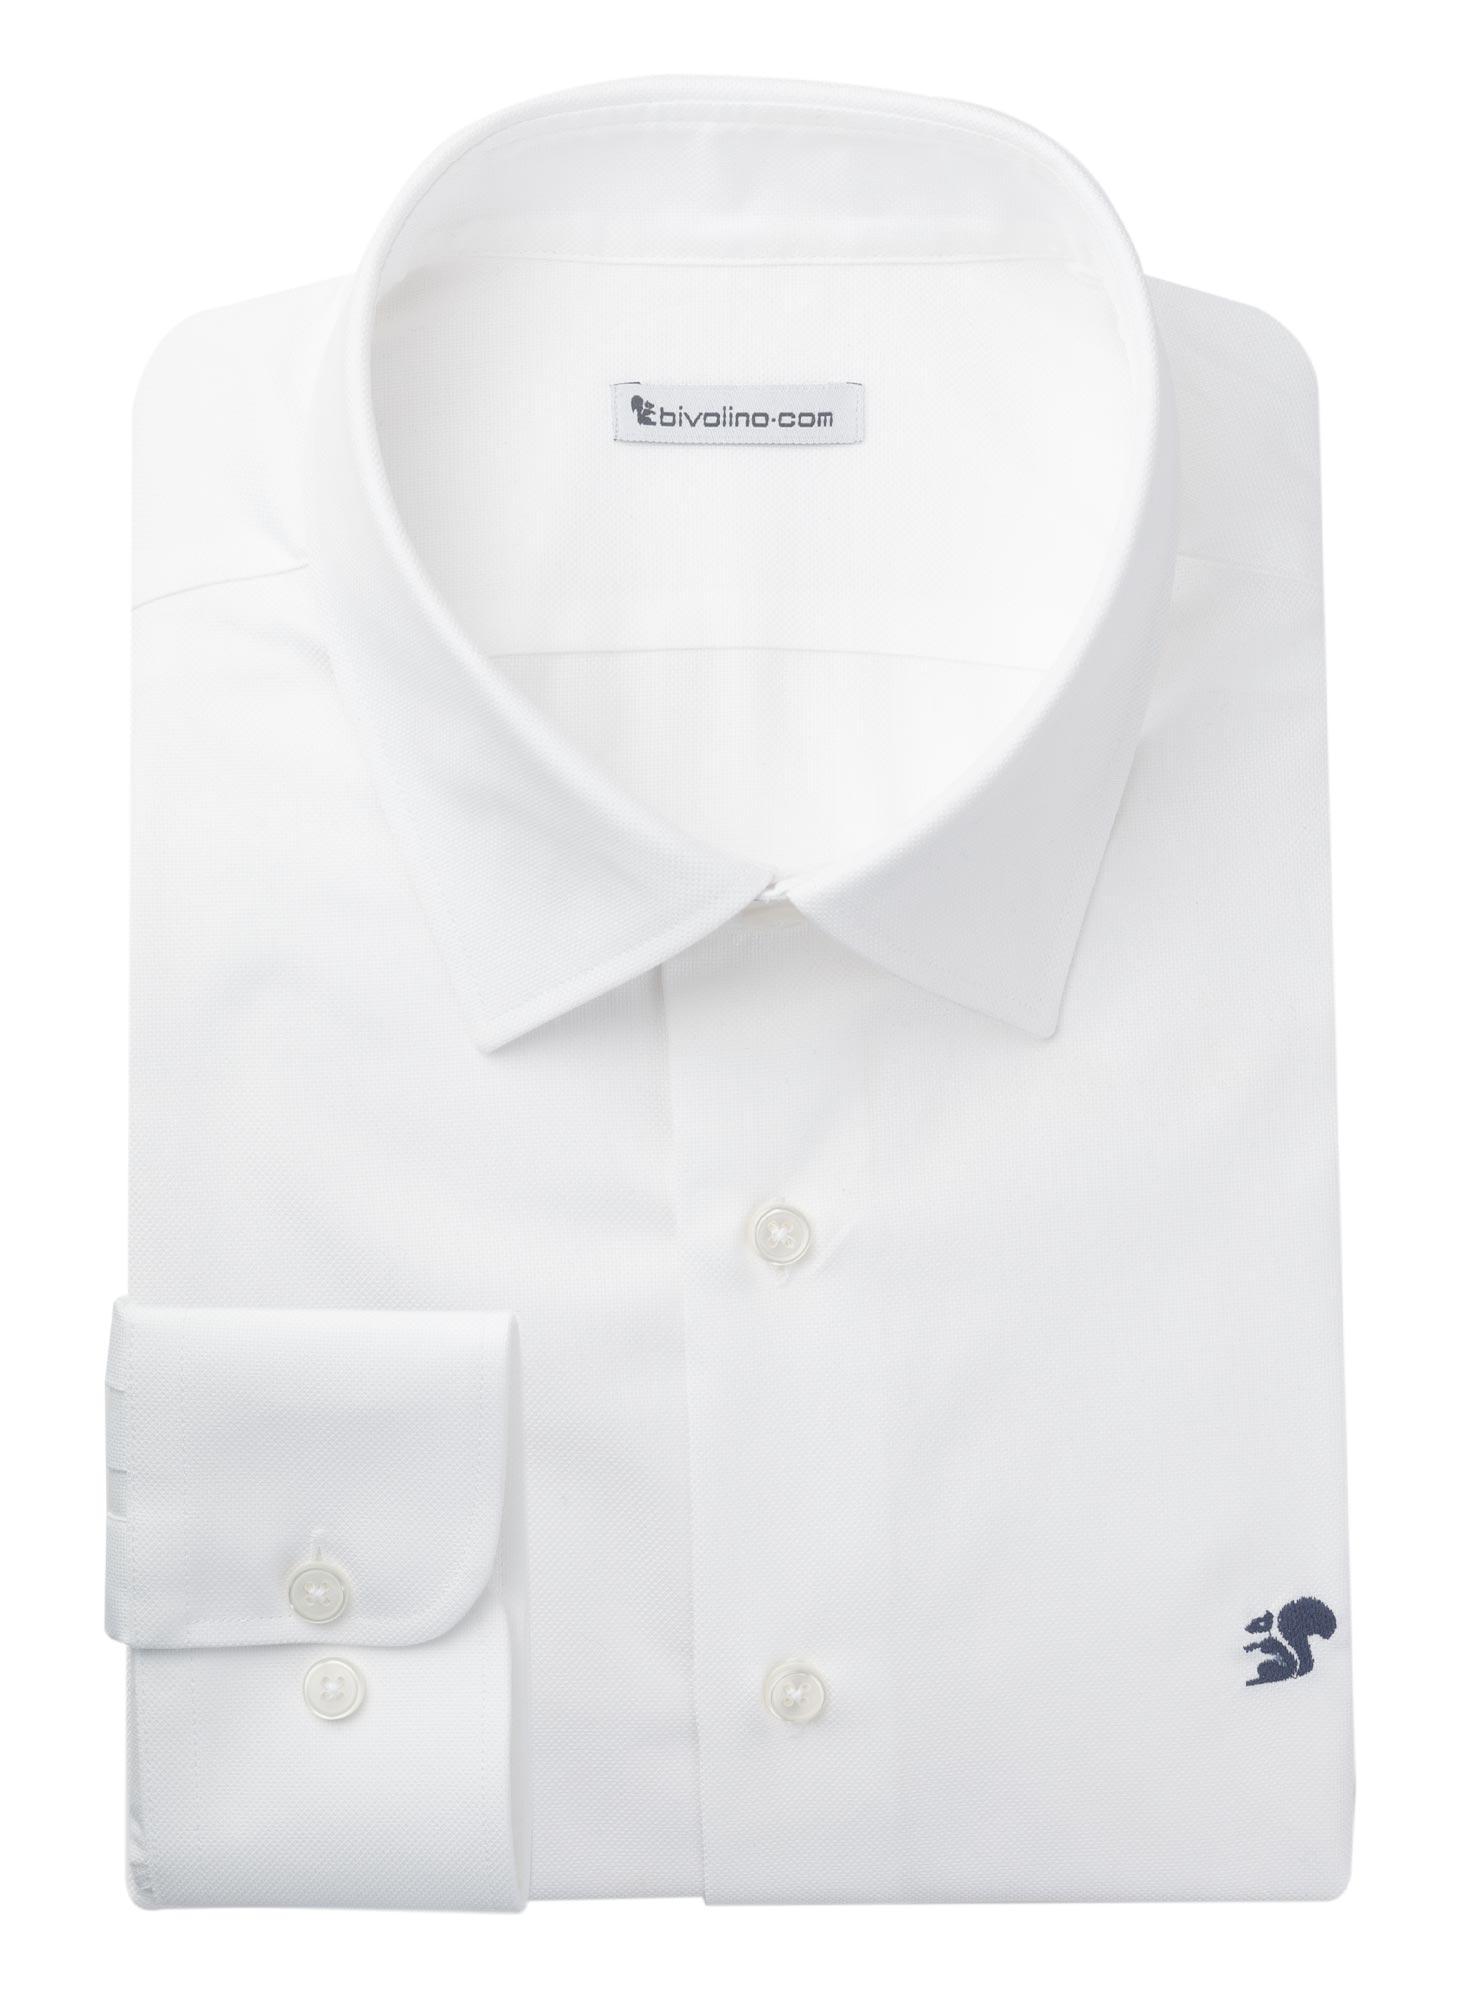 COMO - Royal Oxford weiss Herren Hemd - LABA 5 CLIFTON